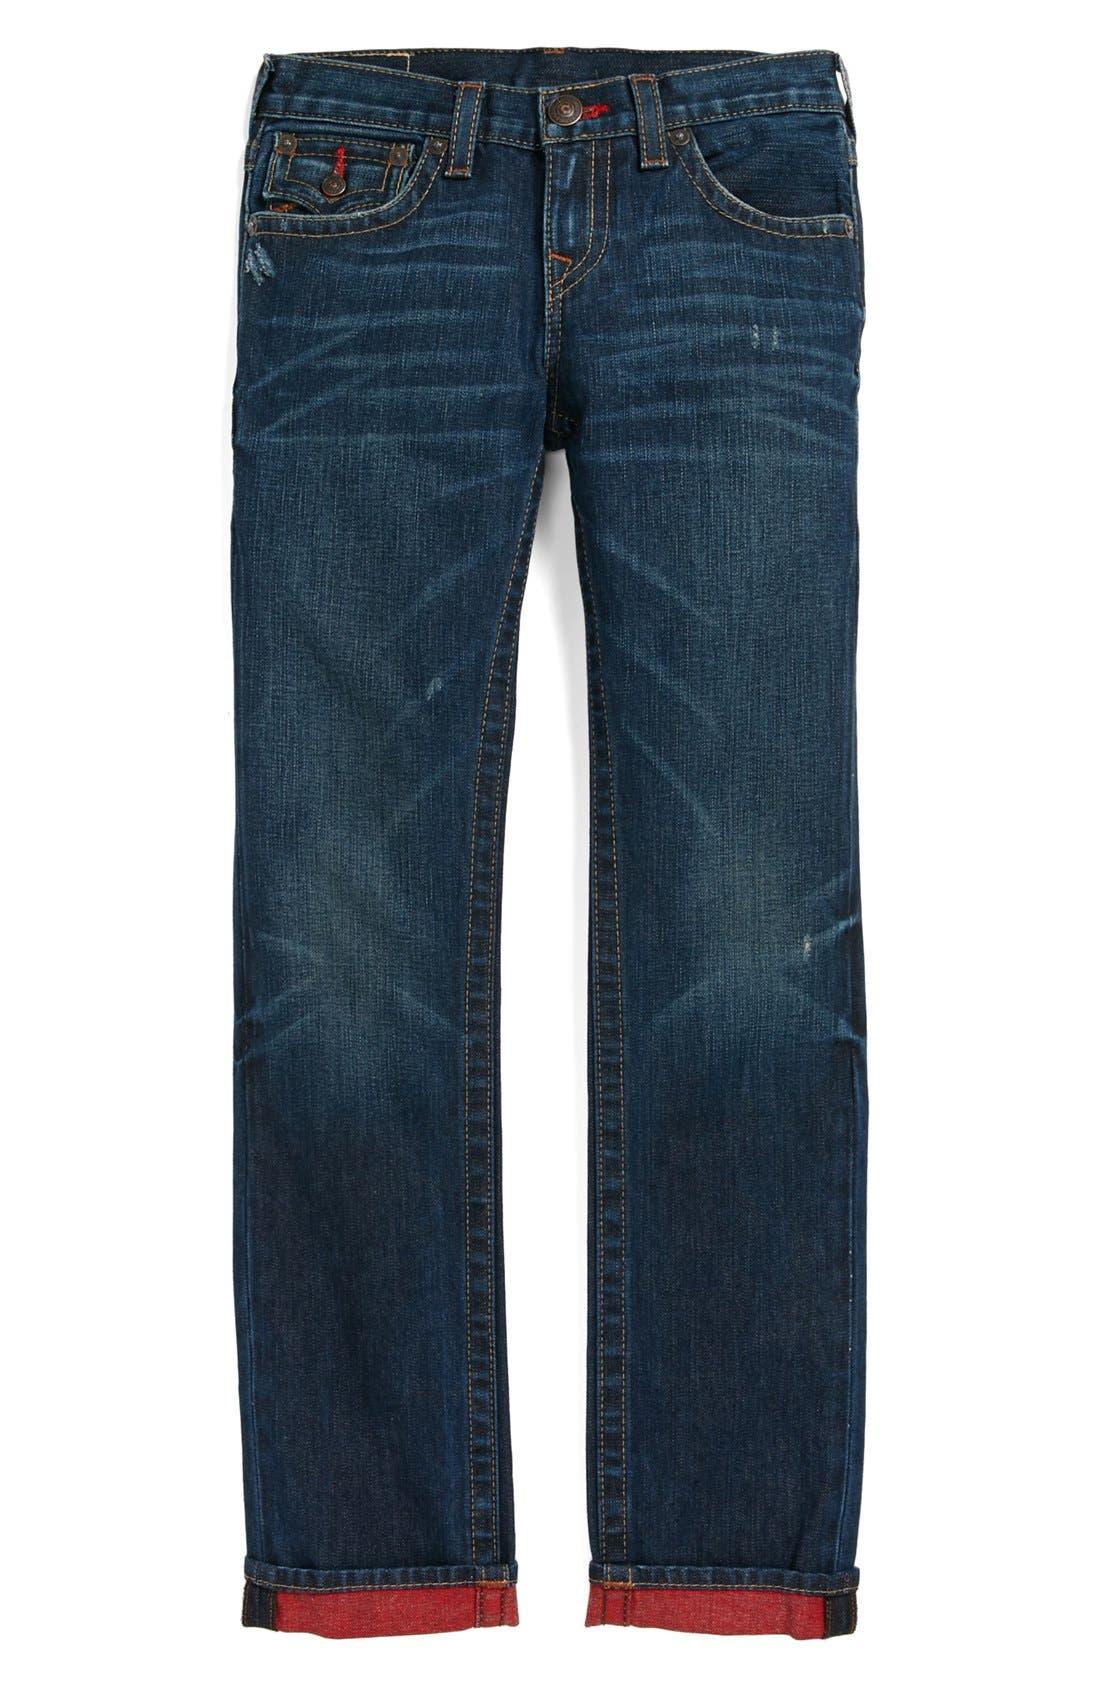 Alternate Image 2  - True Religion Brand Jeans 'Jack' Reverse Dye Slim Leg Jeans (Little Boys & Big Boys)